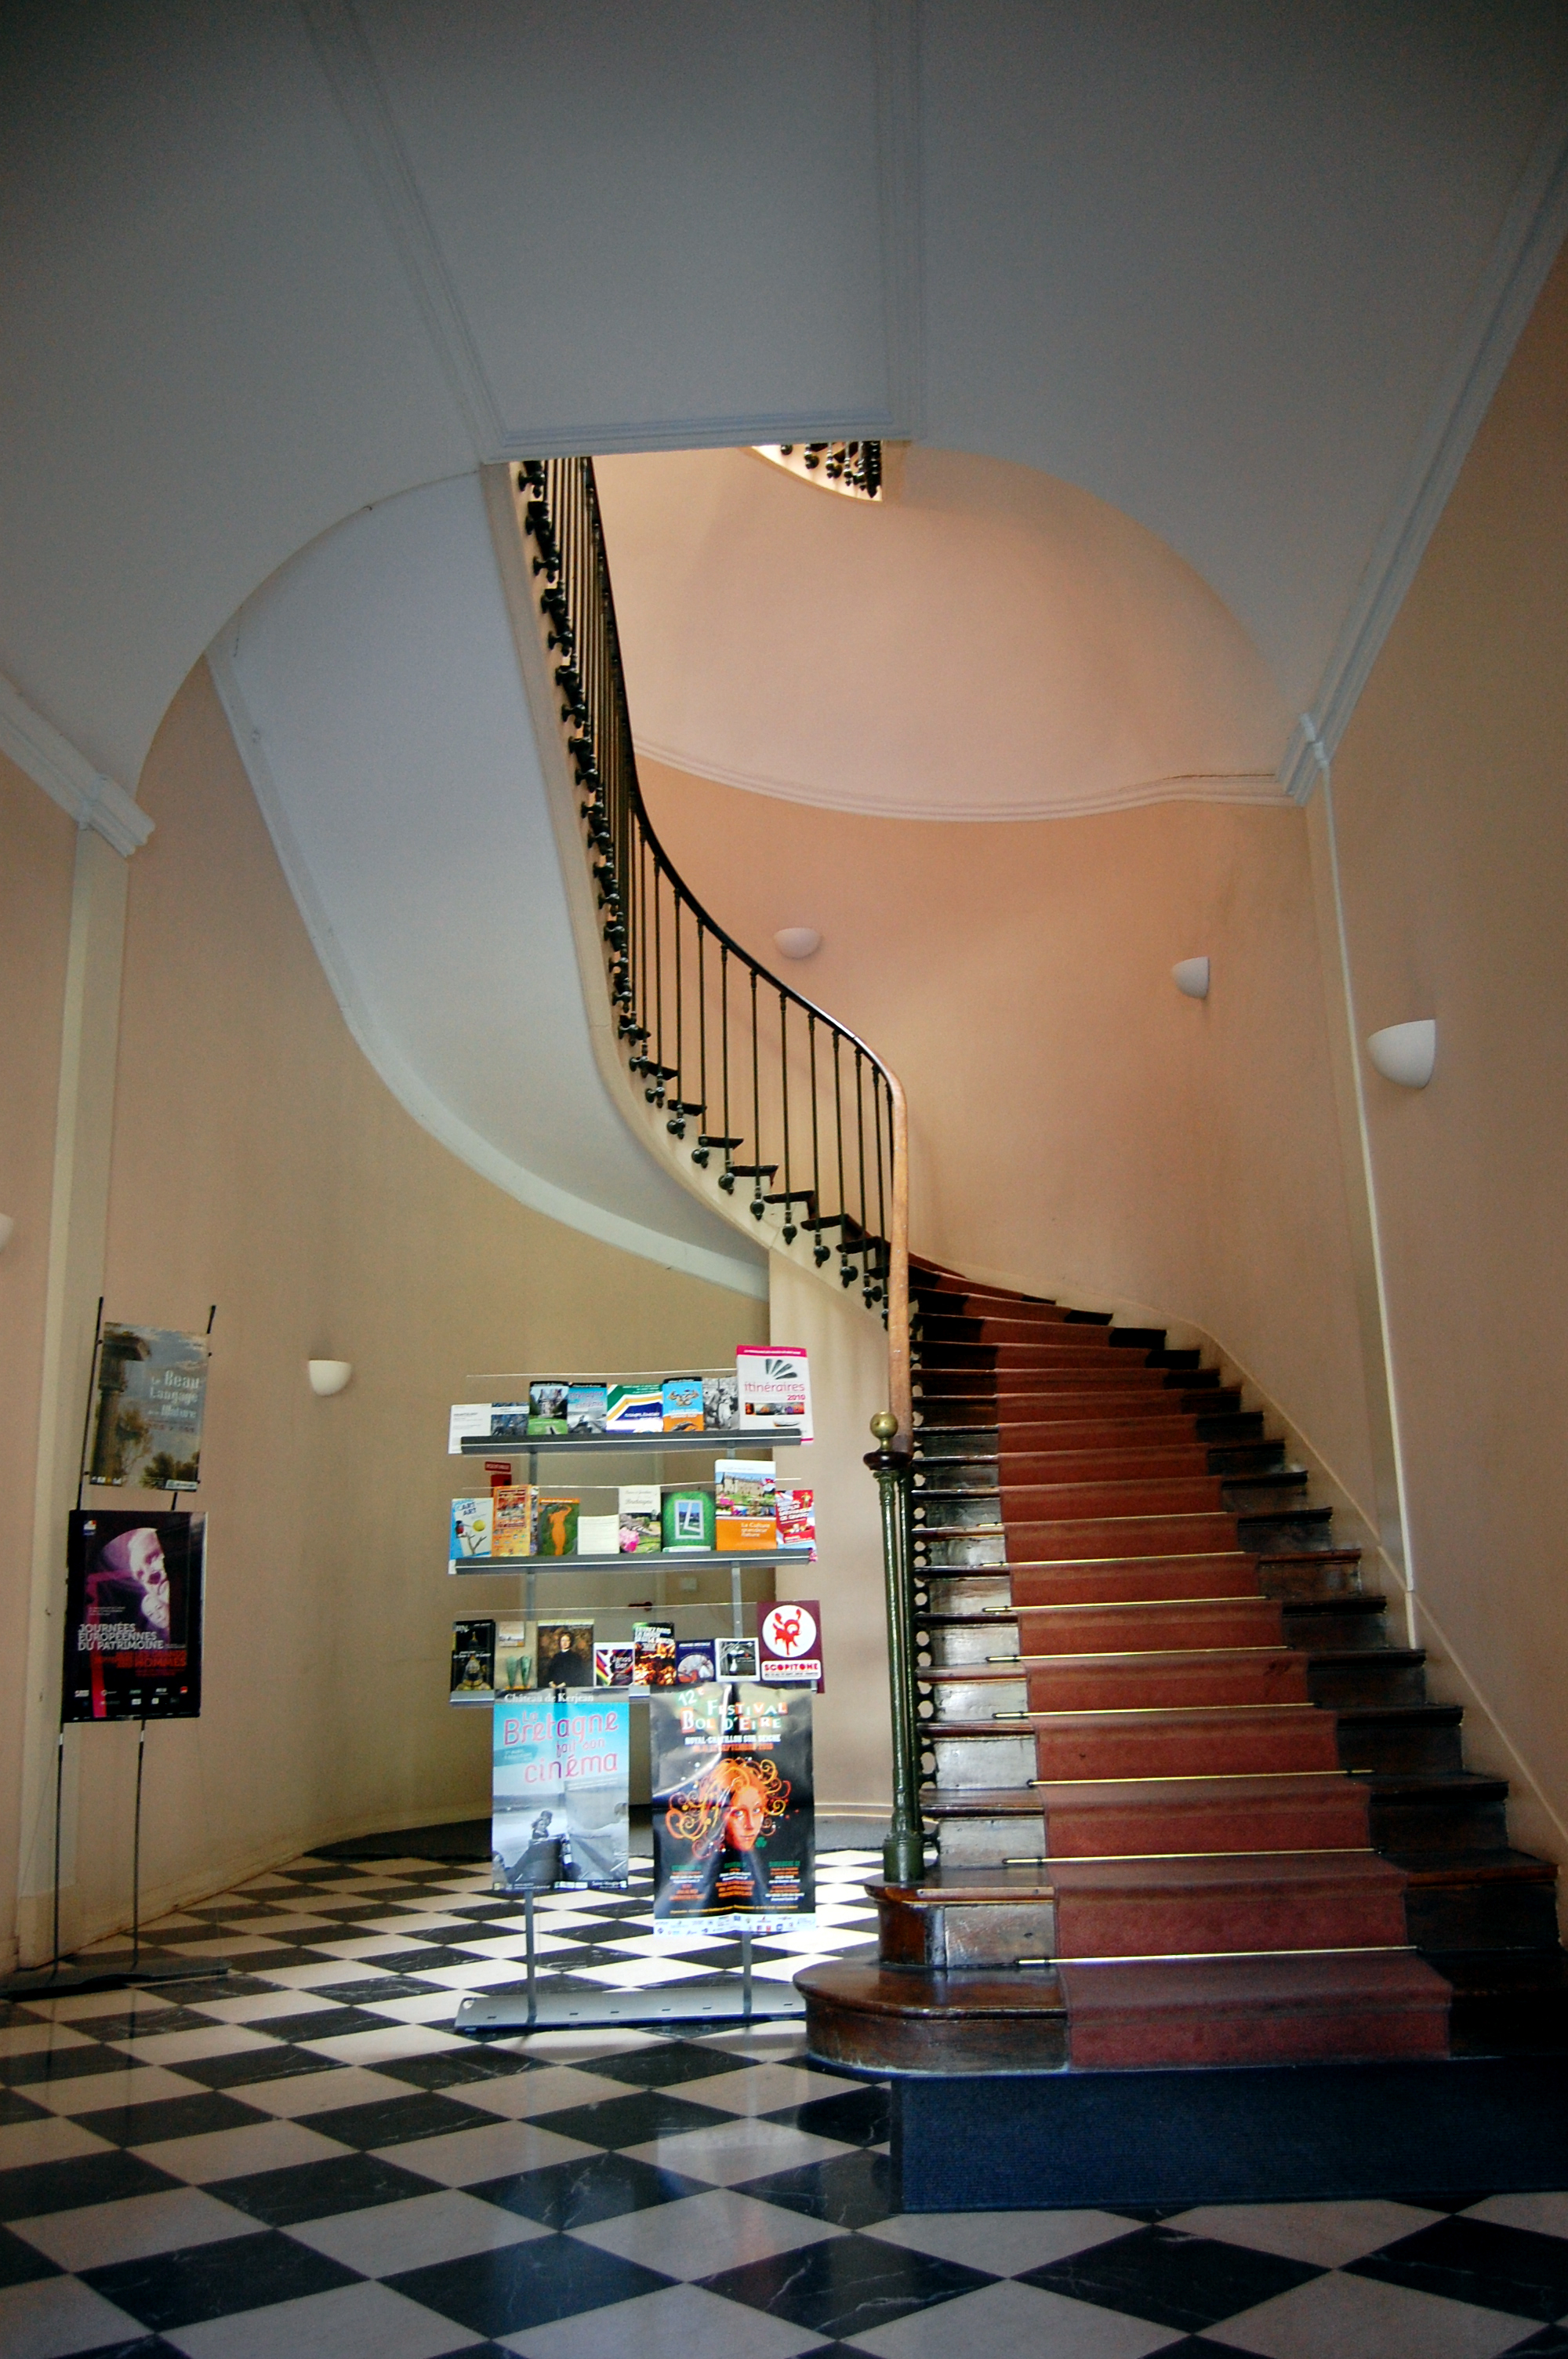 file h tel de blossac escalier int wikimedia. Black Bedroom Furniture Sets. Home Design Ideas